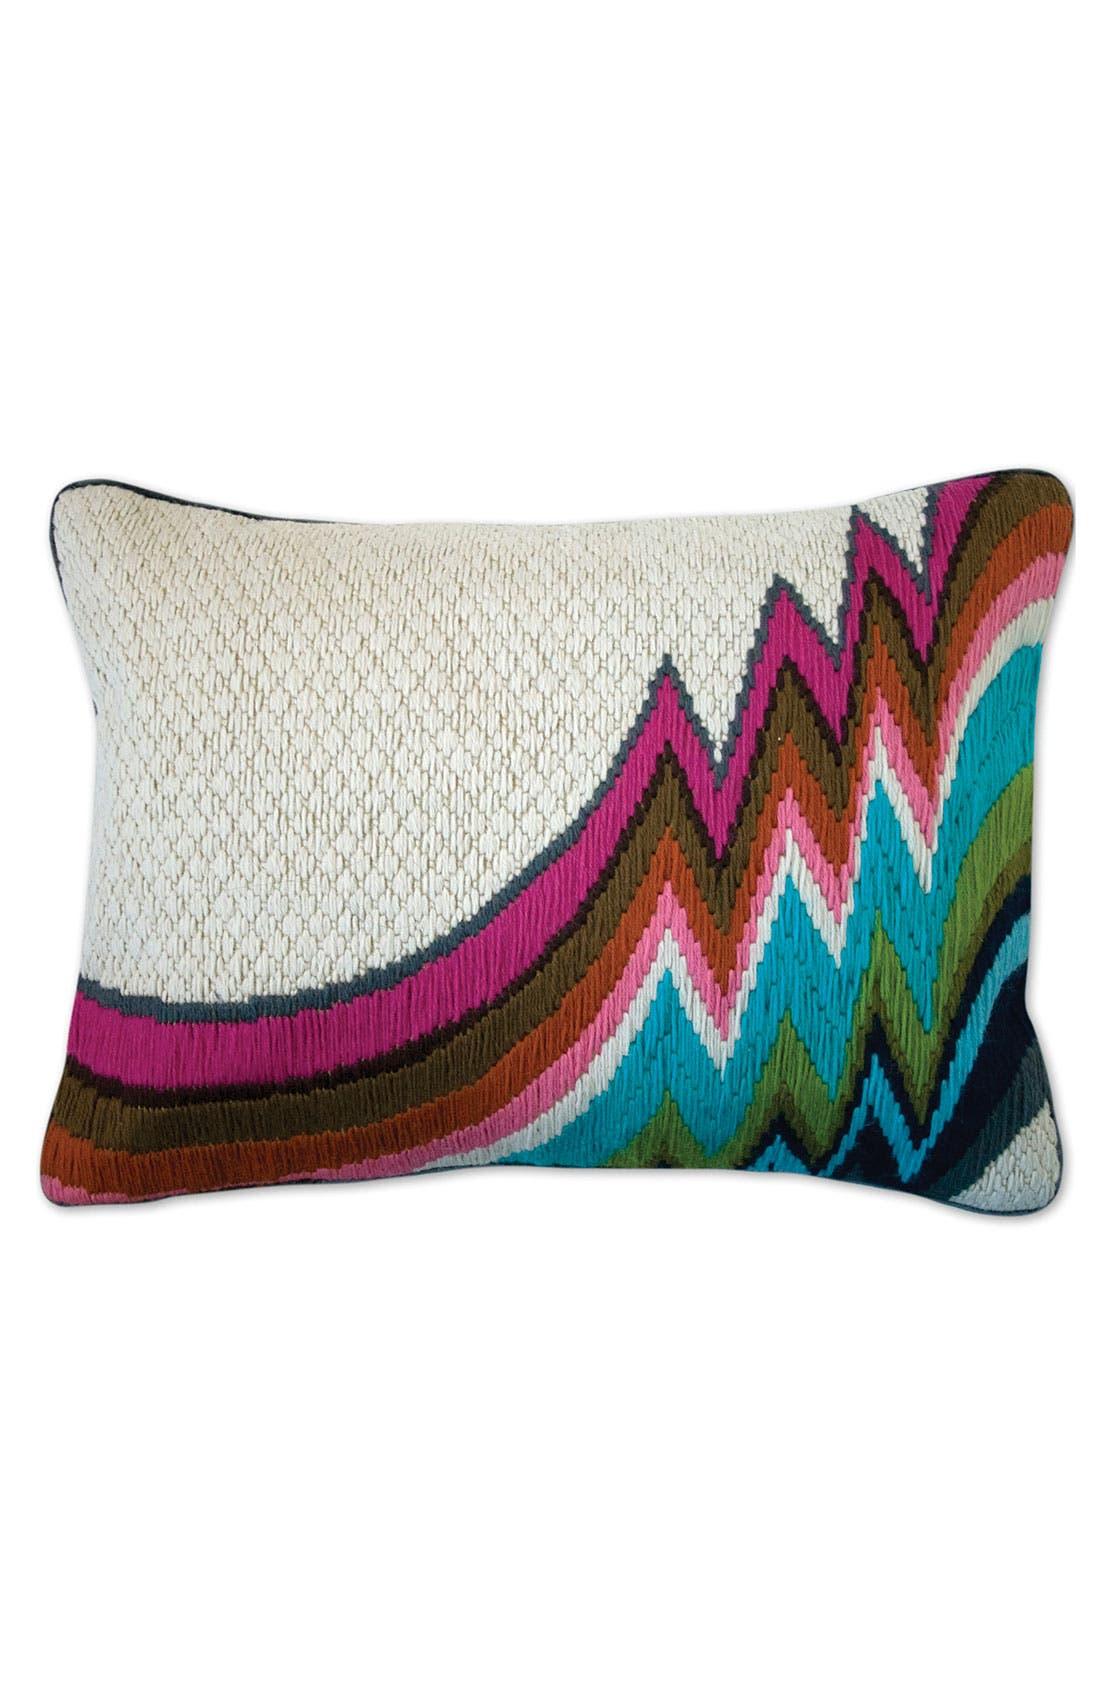 Alternate Image 1 Selected - Jonathan Adler 'Jamaica Lane Bargello' Pillow